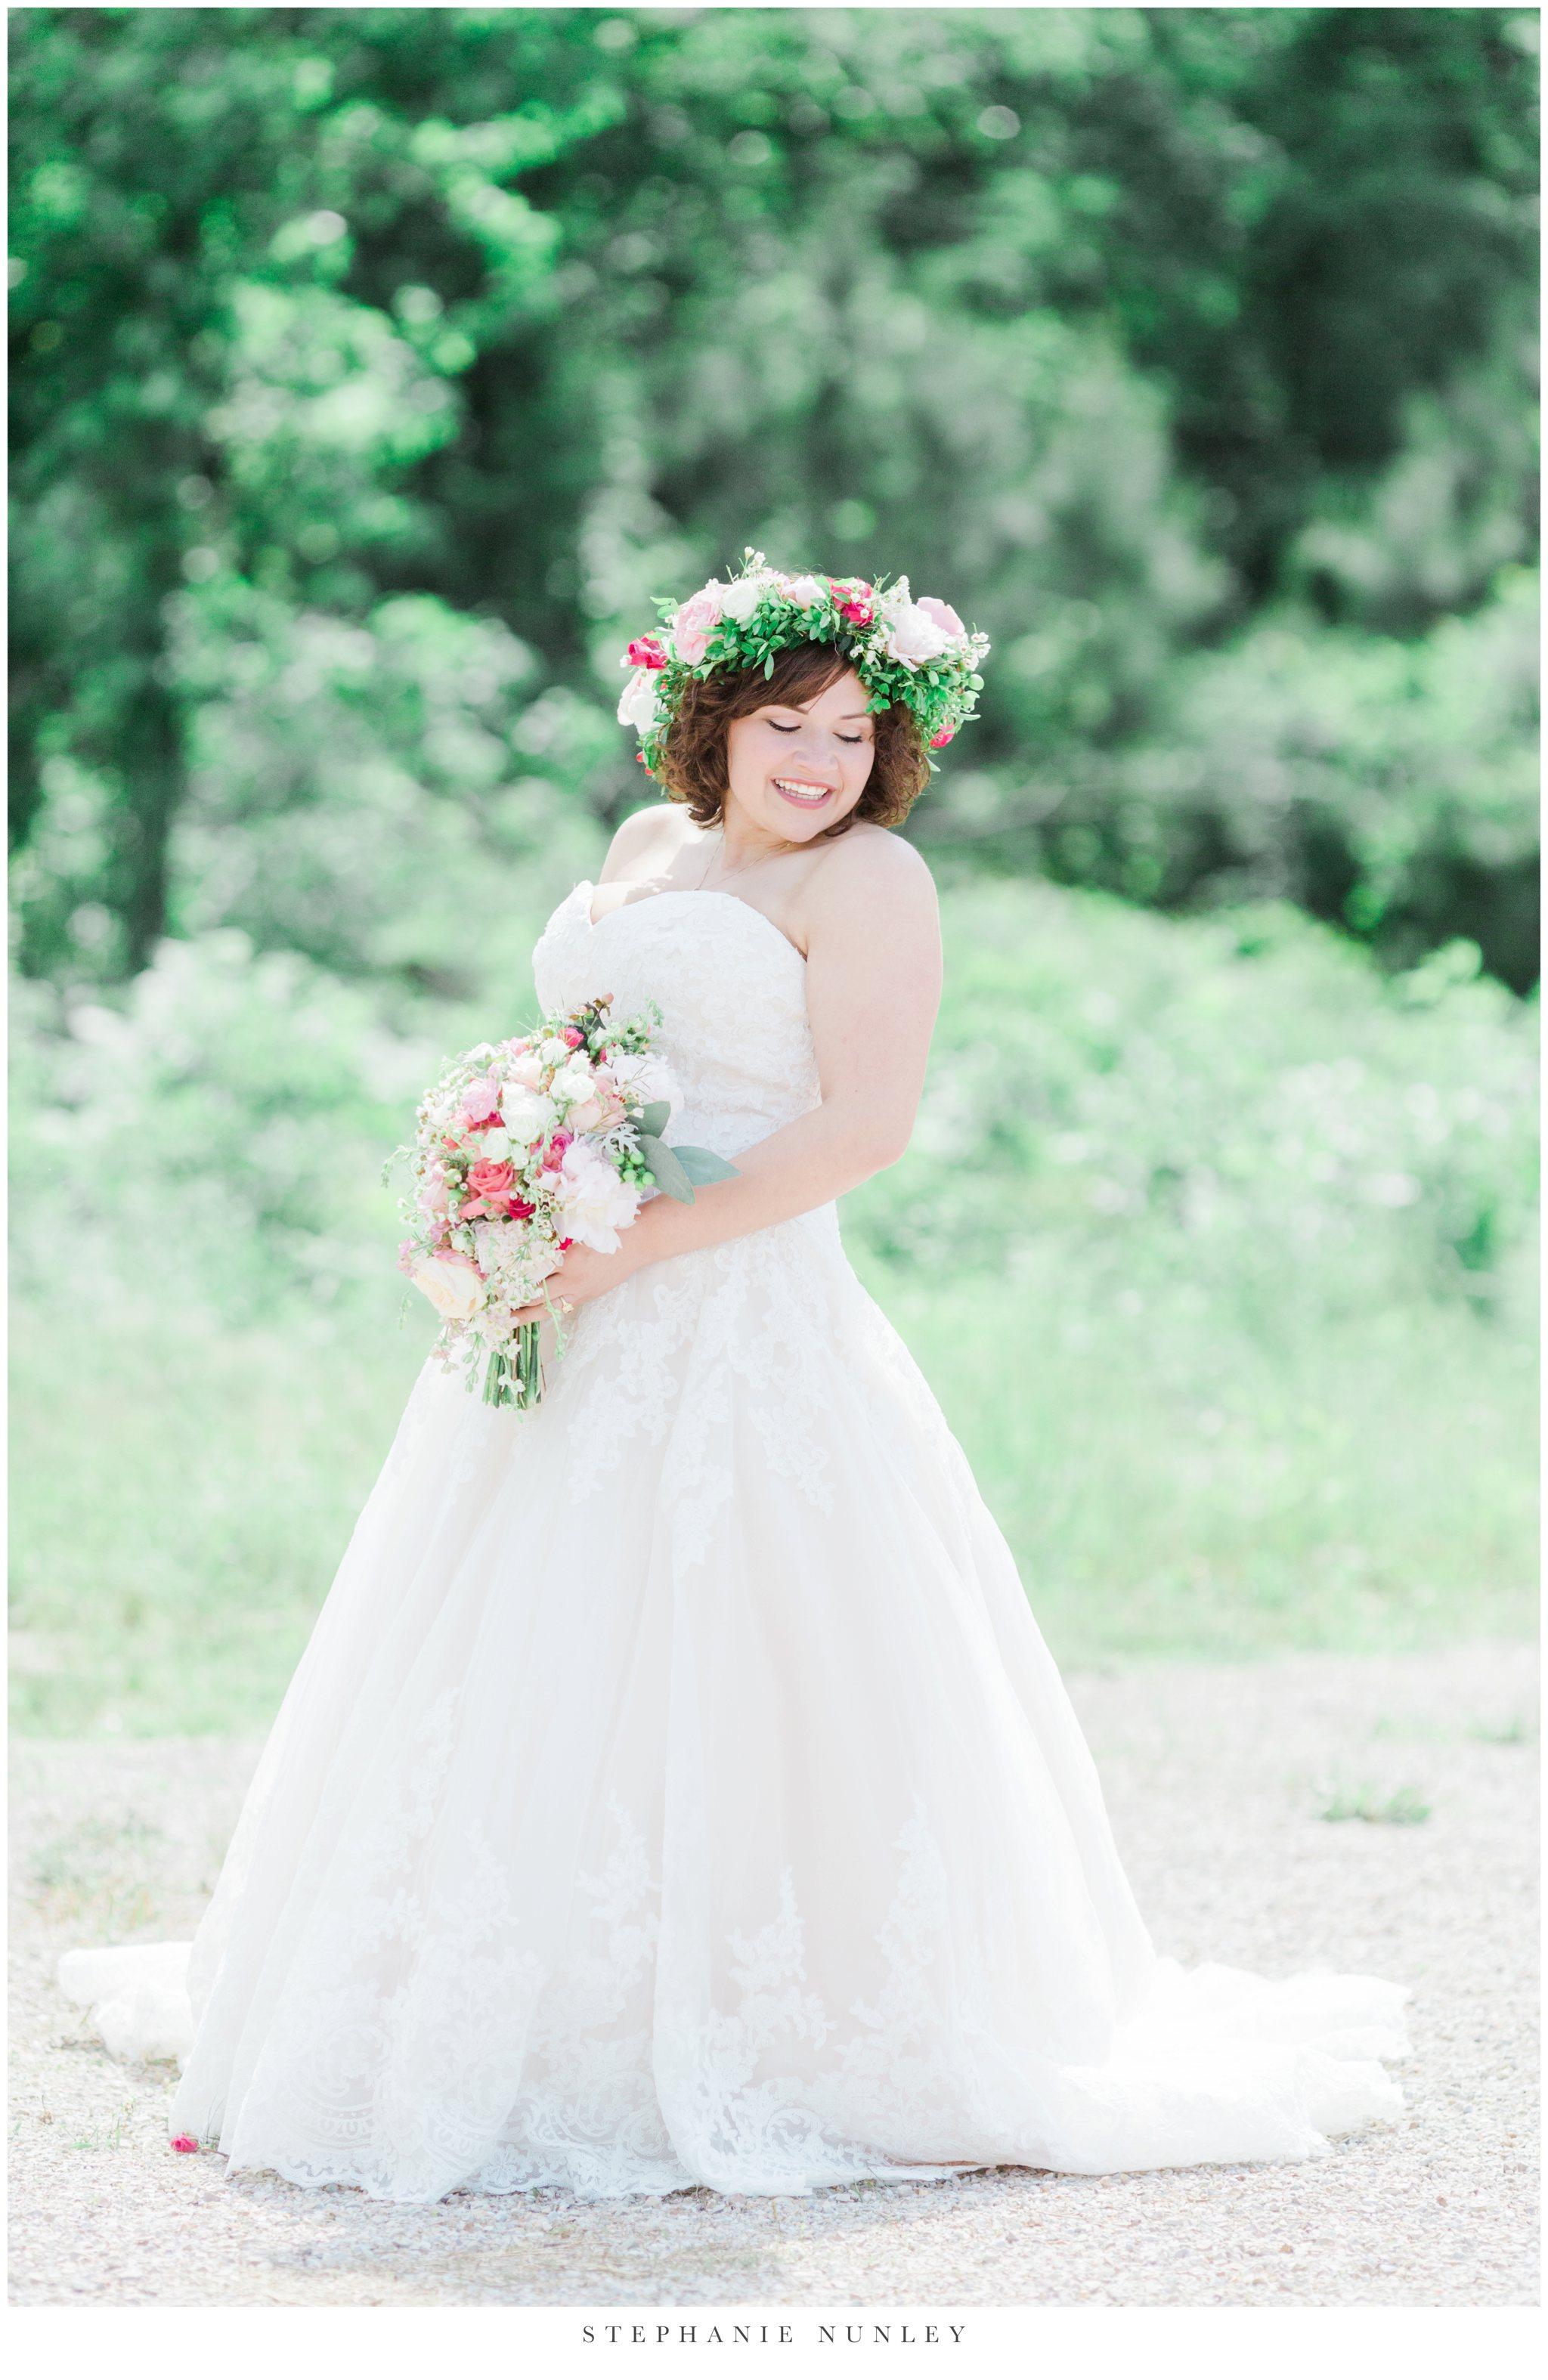 romantic-outdoor-wedding-with-flower-crown-0048.jpg